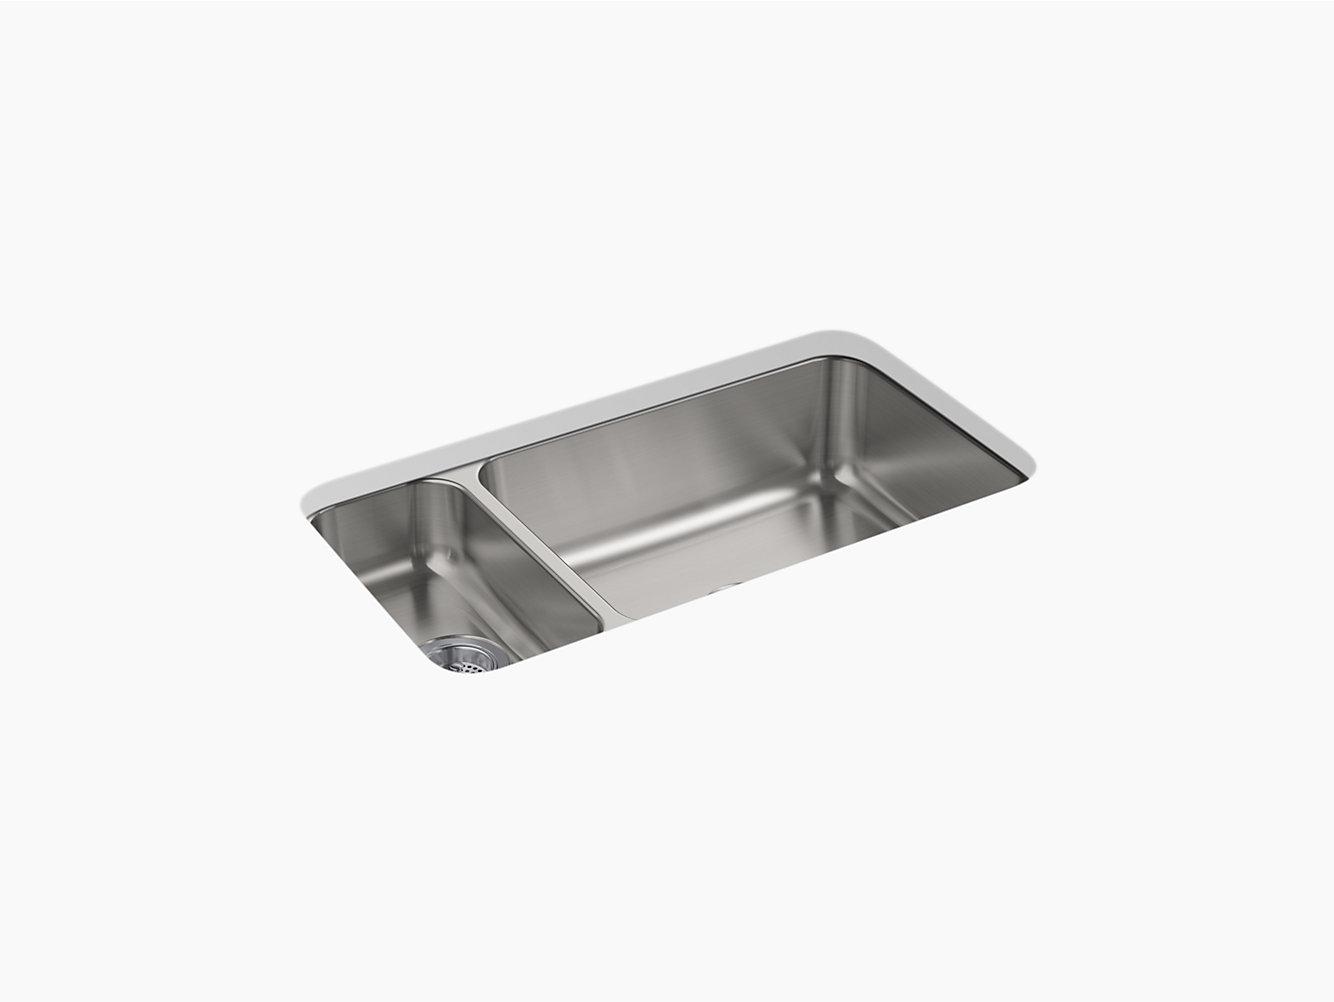 McAllister Under-Mount High/Low Small/Large Kitchen Sink, 31-3/4\